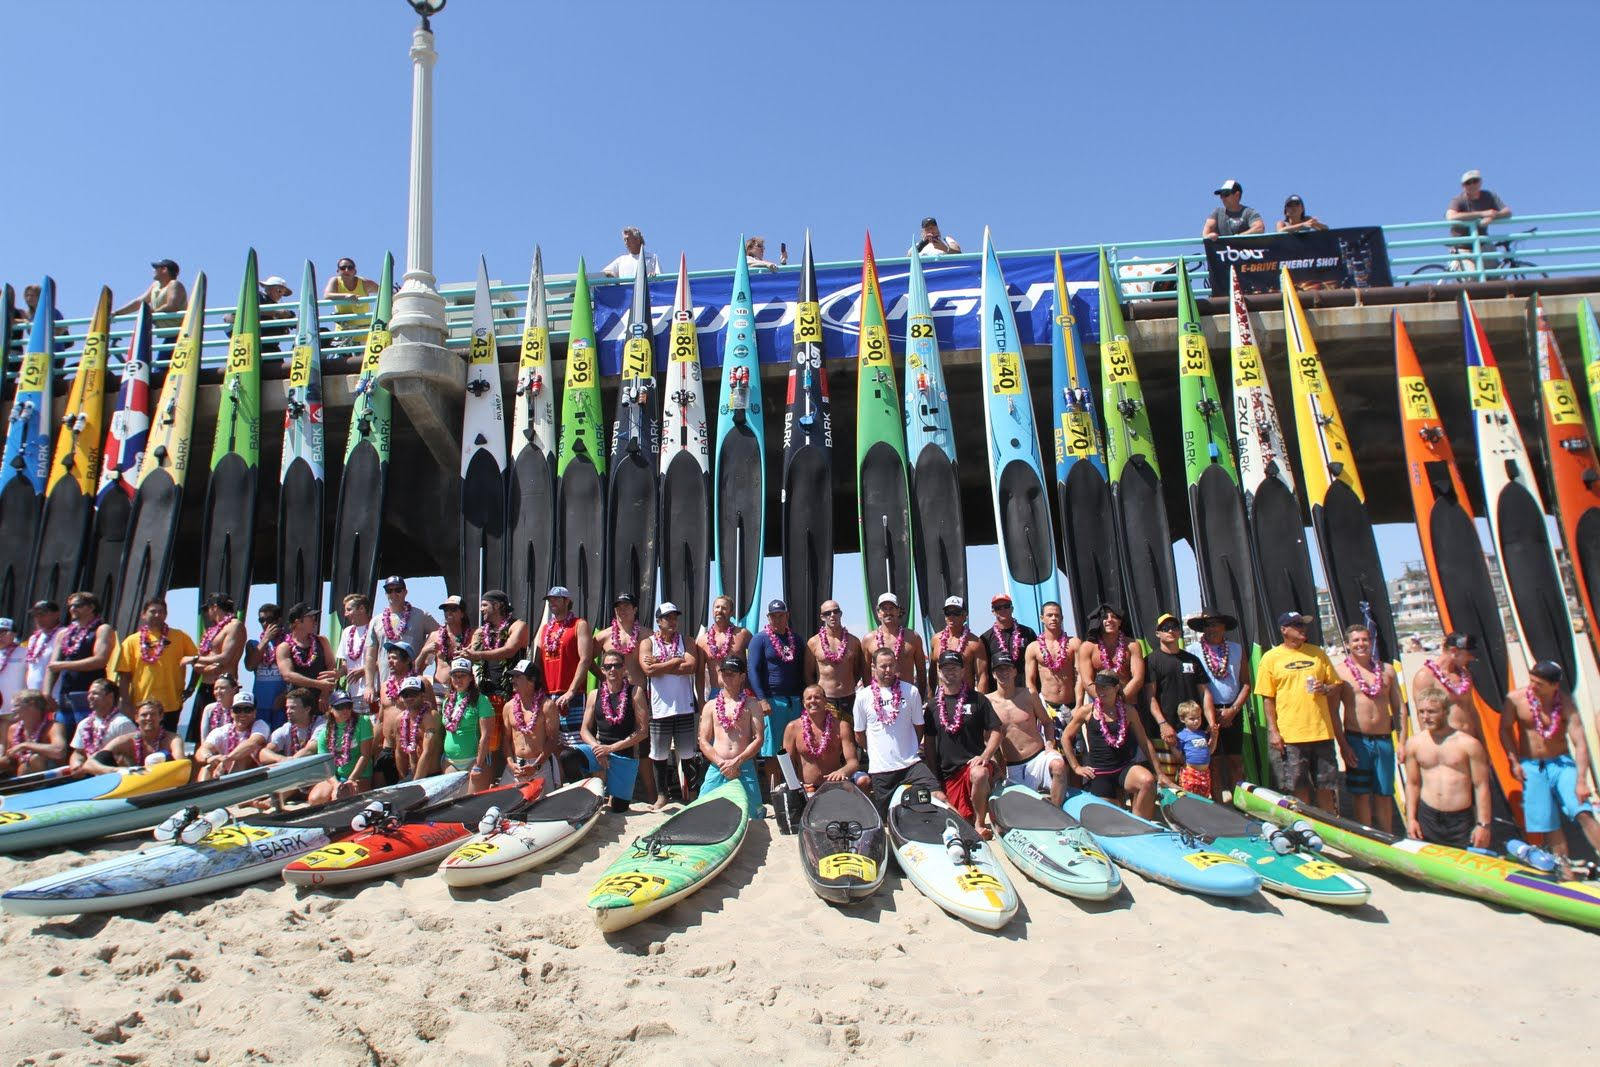 The Catalina Clic Paddleboard Race